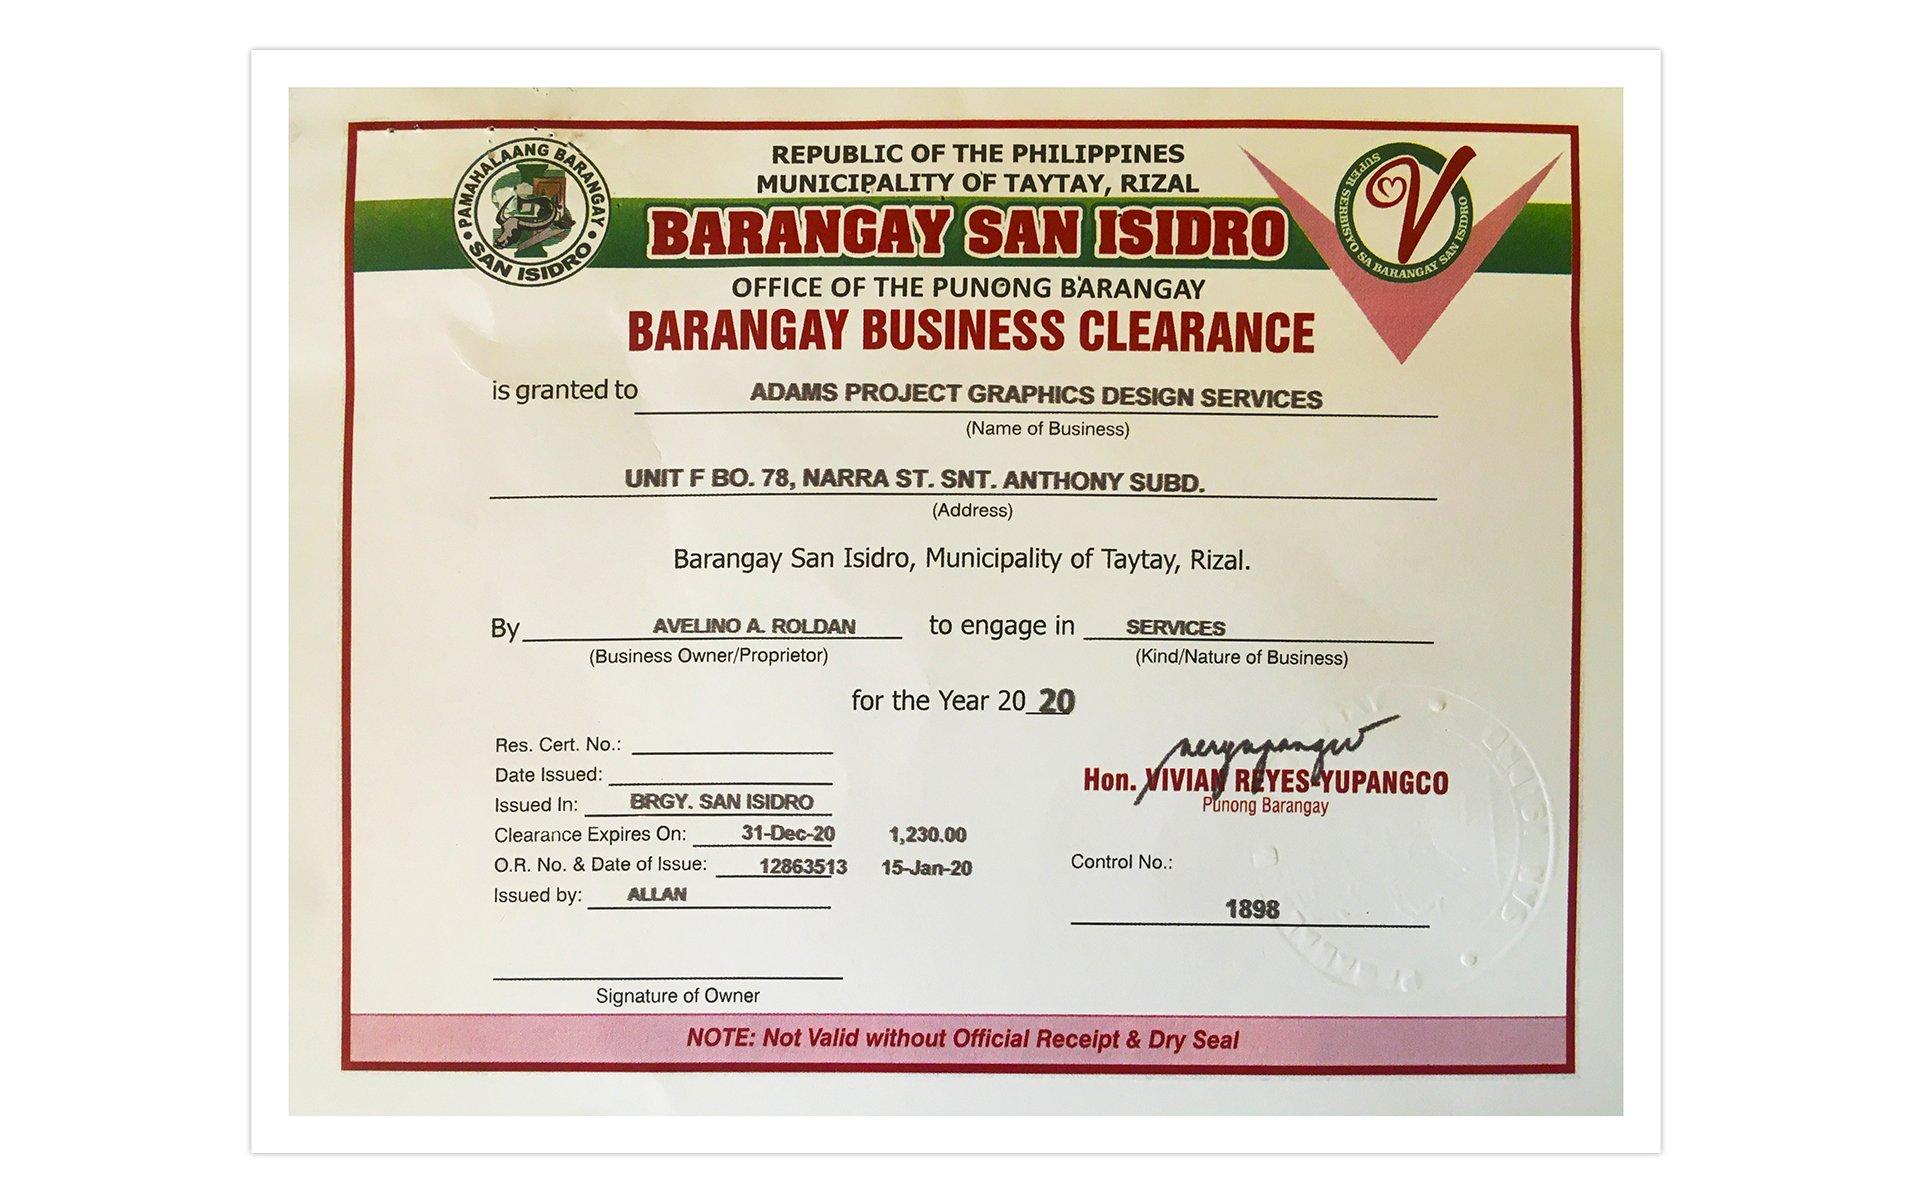 Barangay Business Clearance